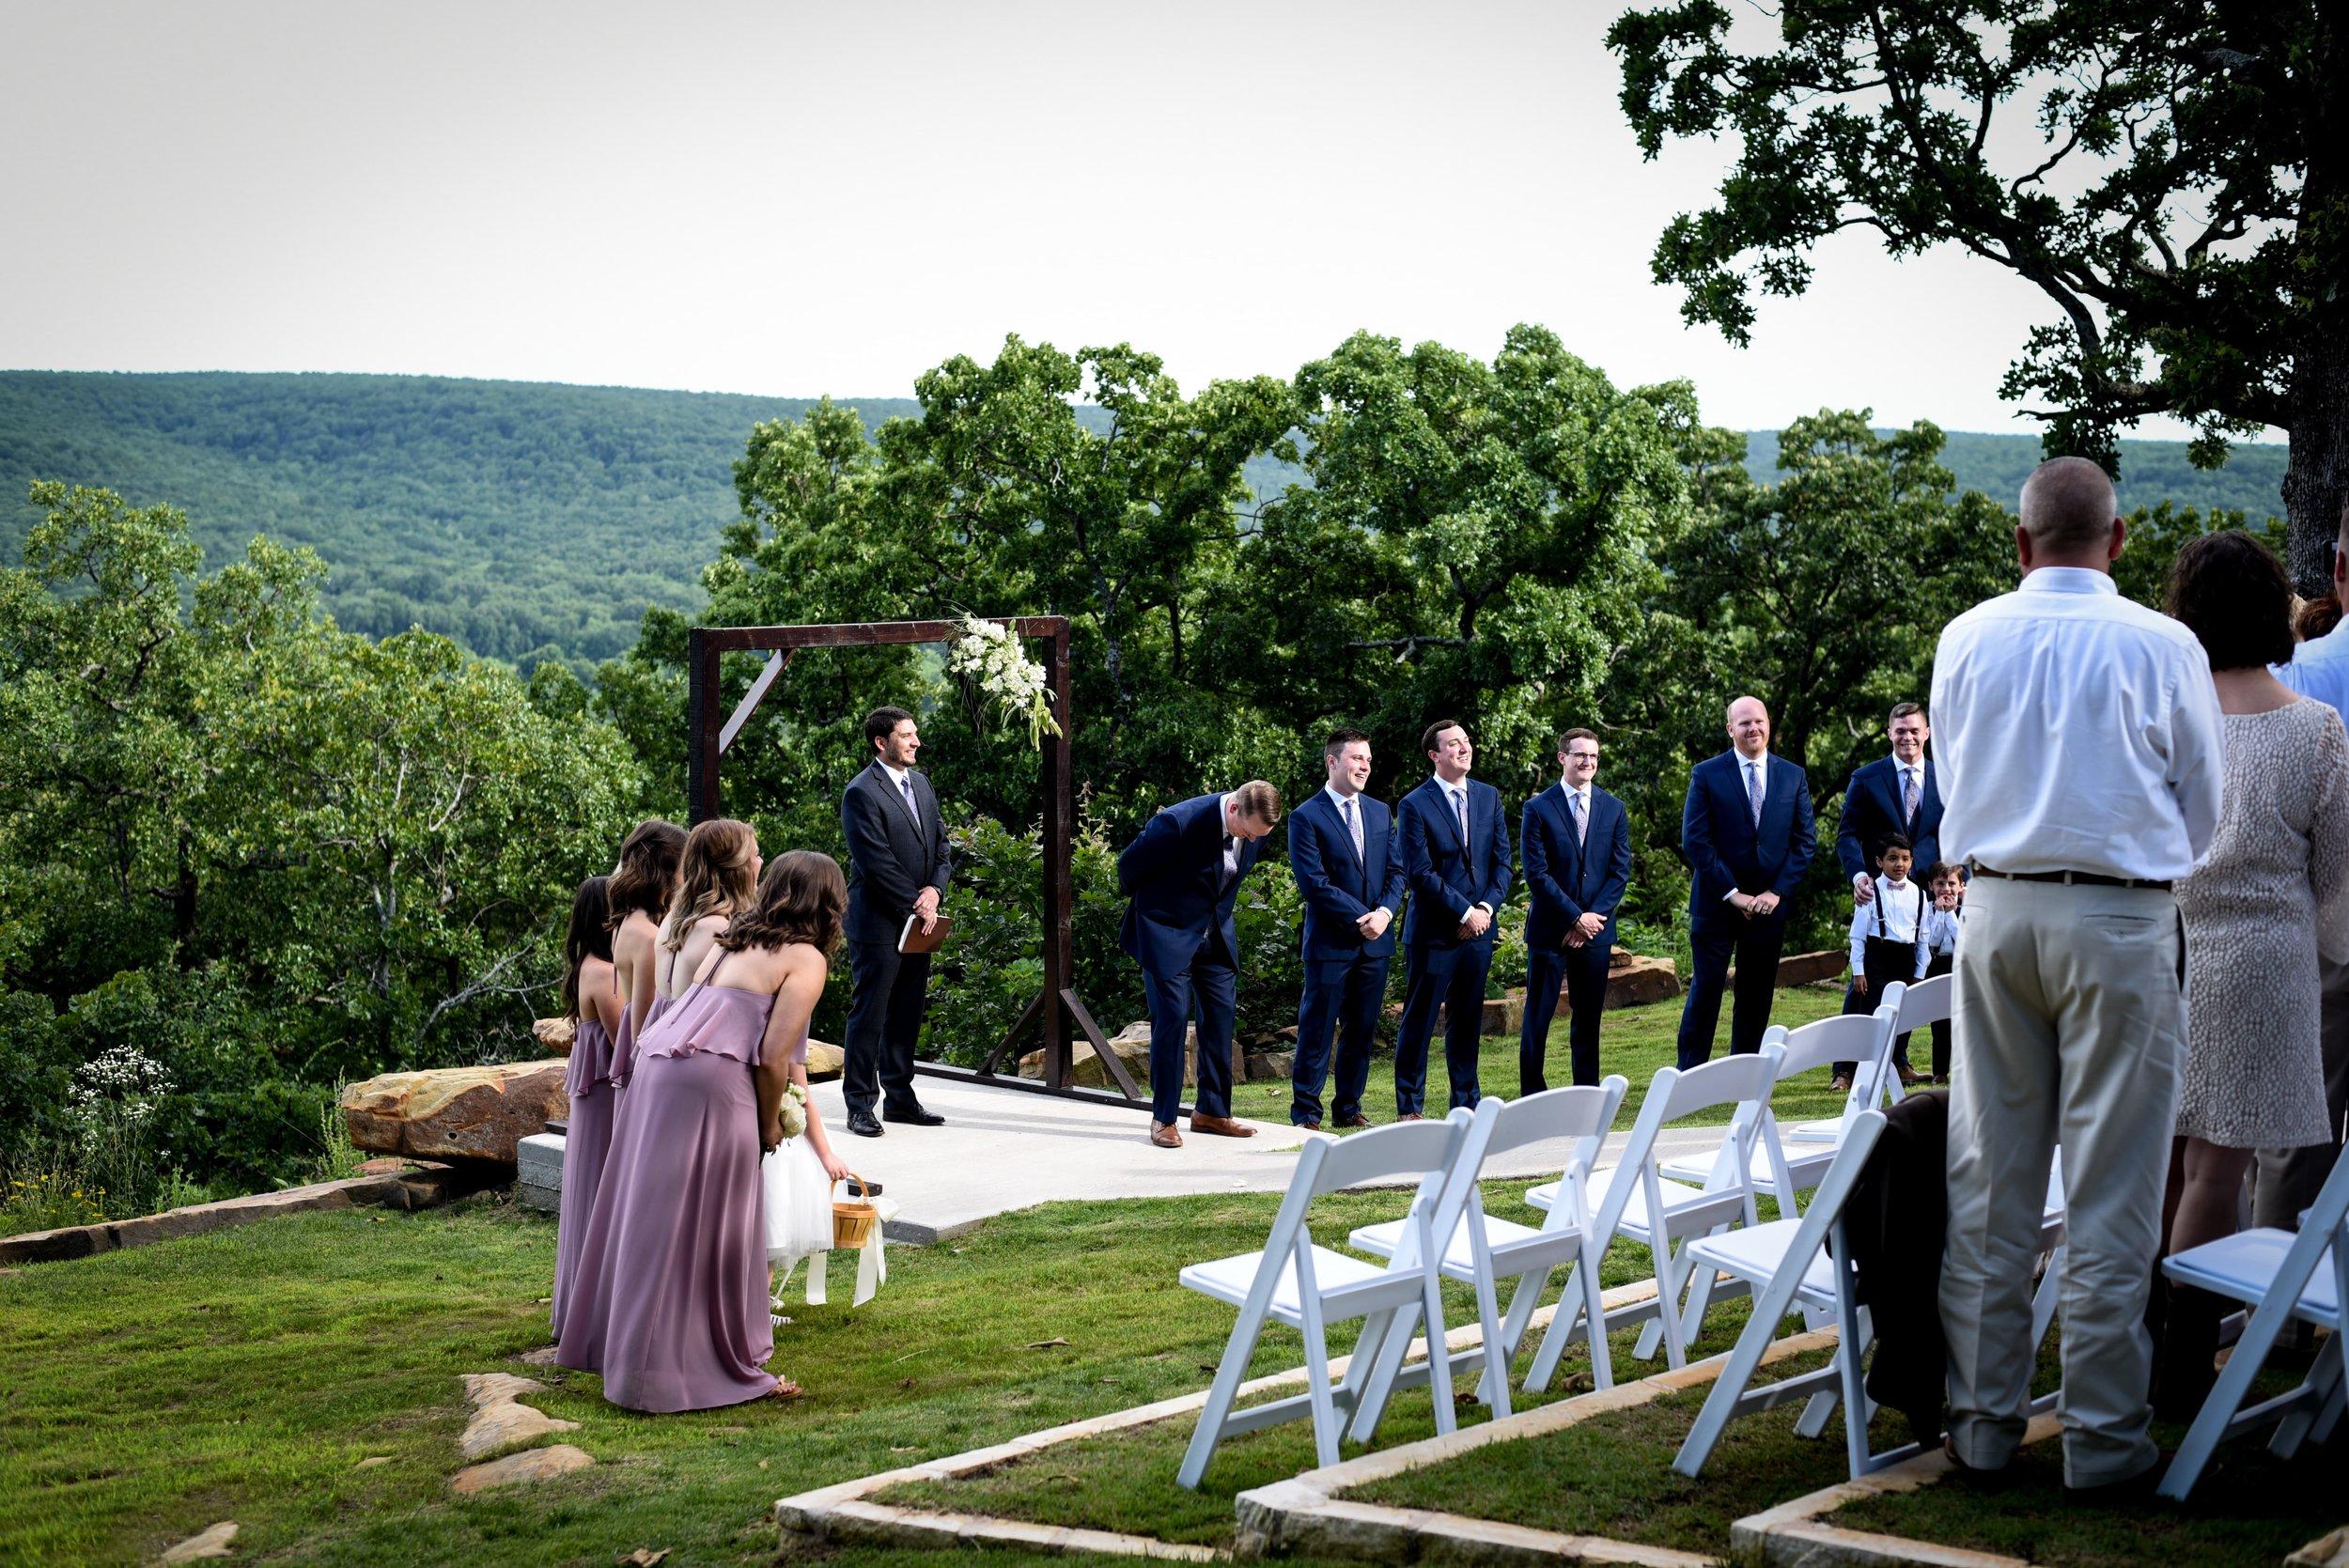 Modern Bright Light White Tulsa Wedding Venue 27b-min.jpg